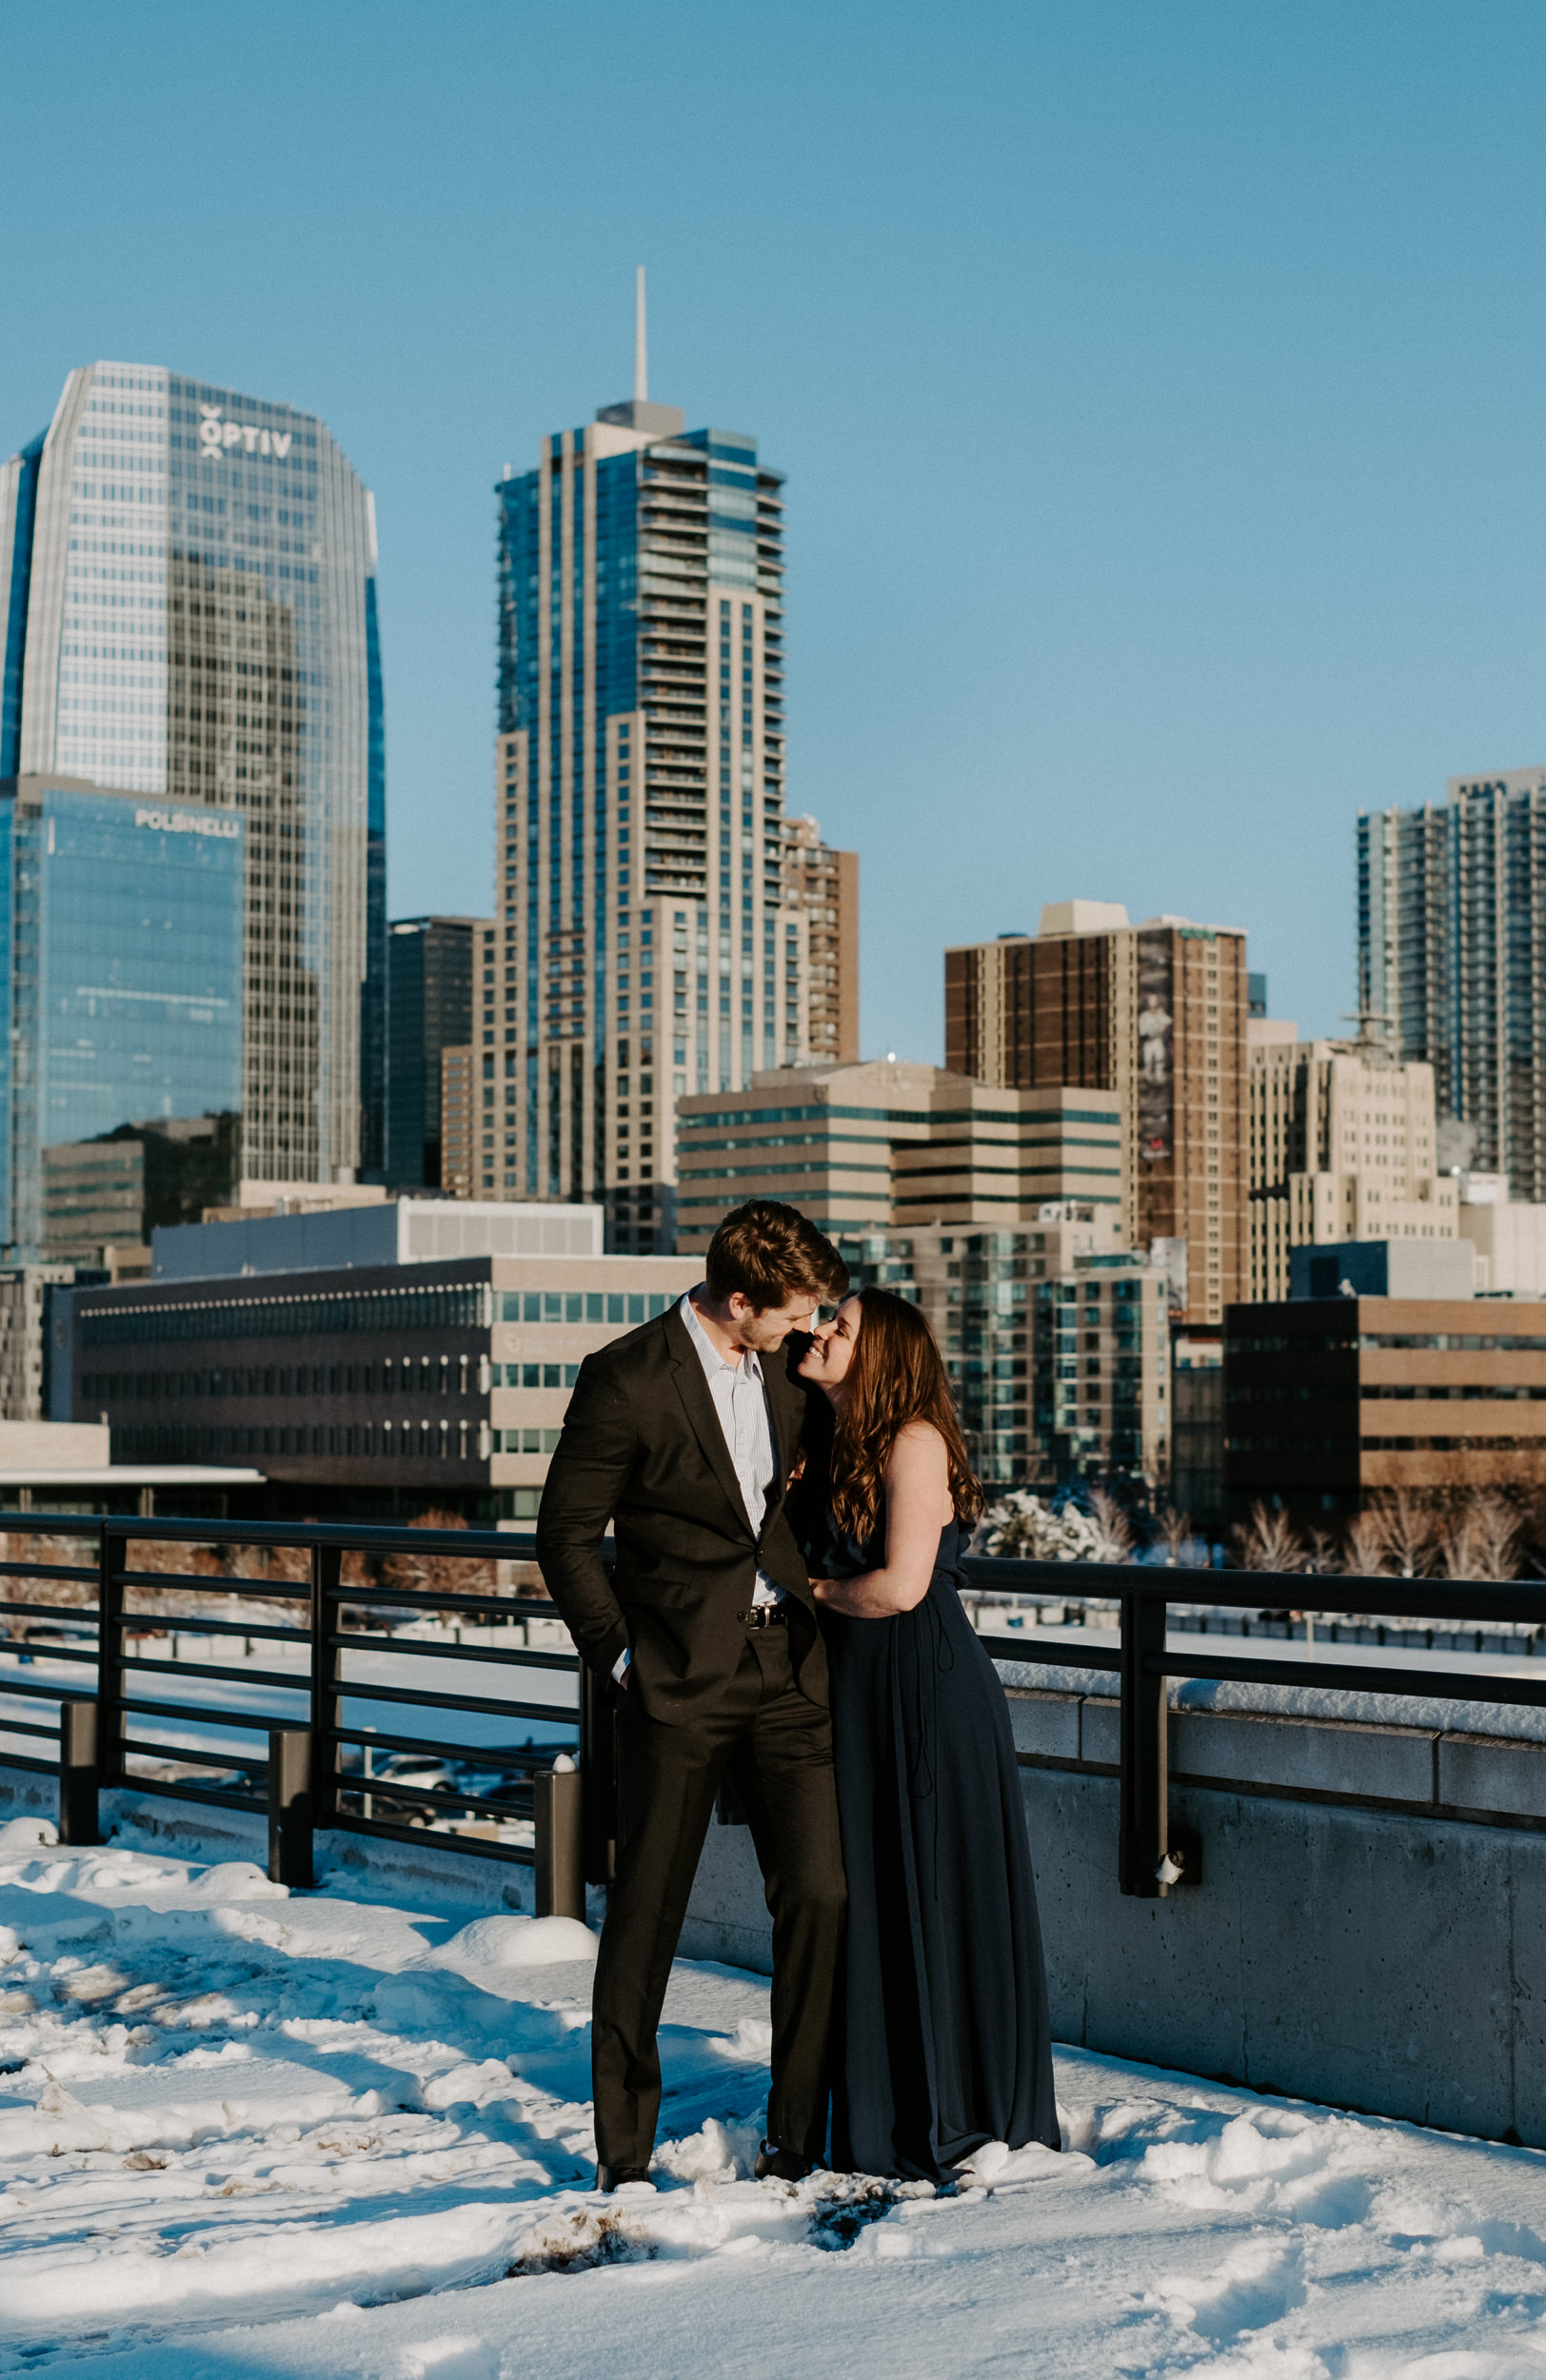 Denver engagement session locations. Downtown Denver engagement photos. Colorado engagement photography.